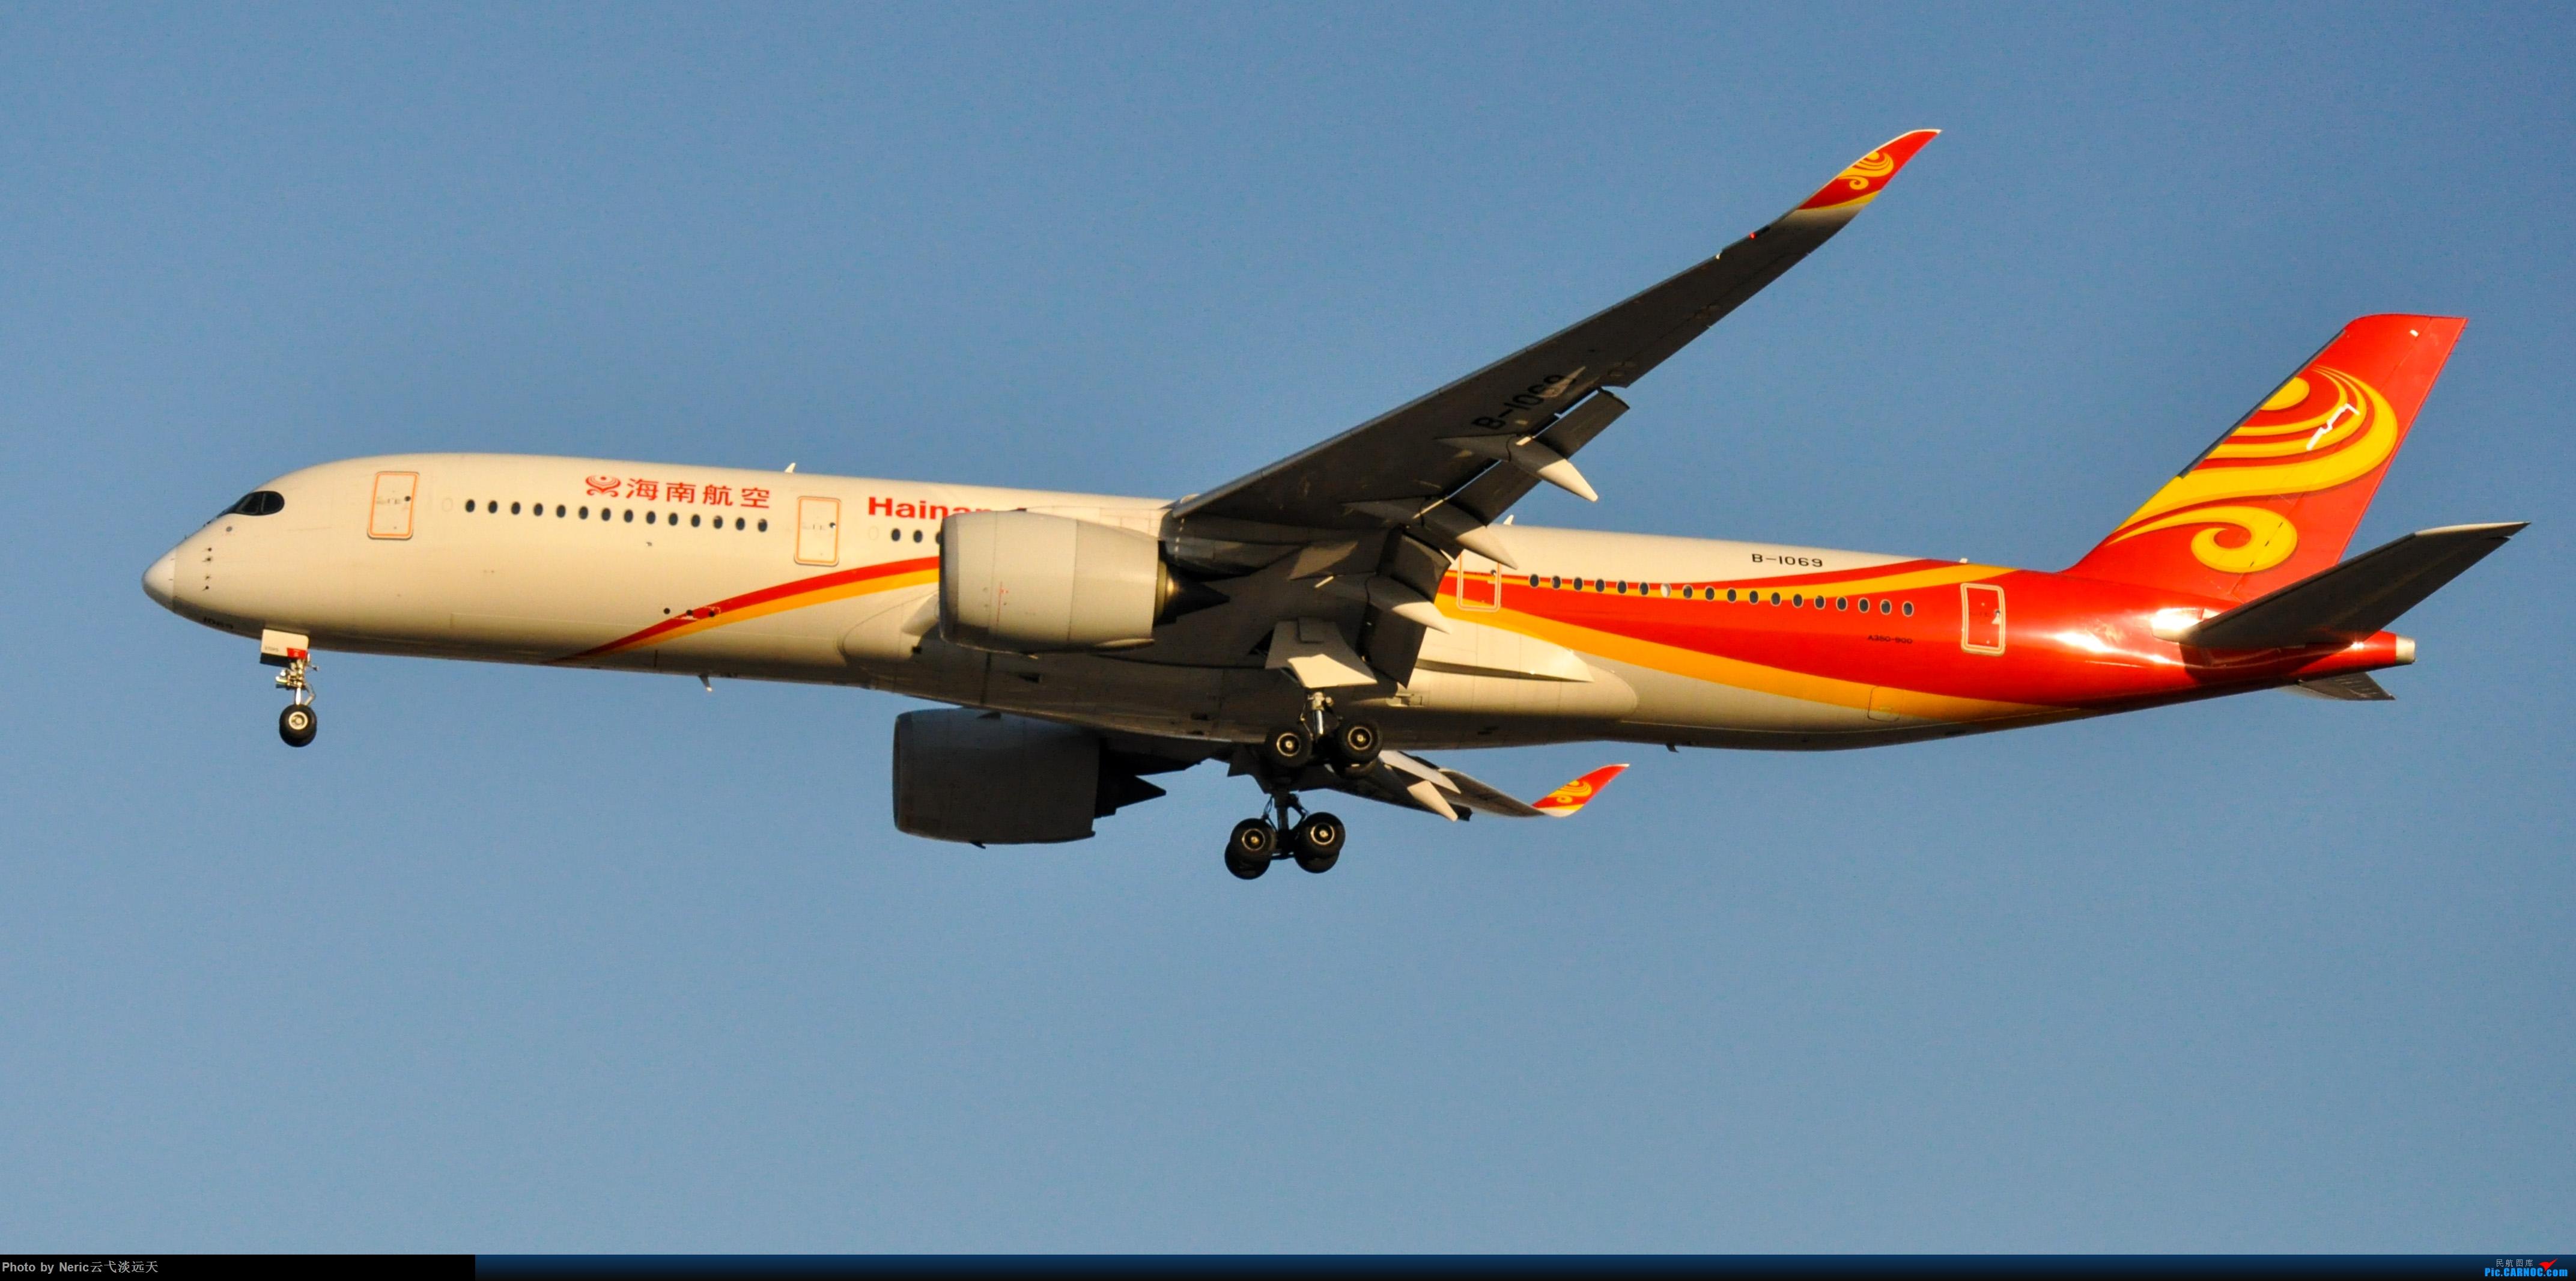 Re:[原创]旅行拍机 AIRBUS A350-900 B-1069 中国北京首都国际机场